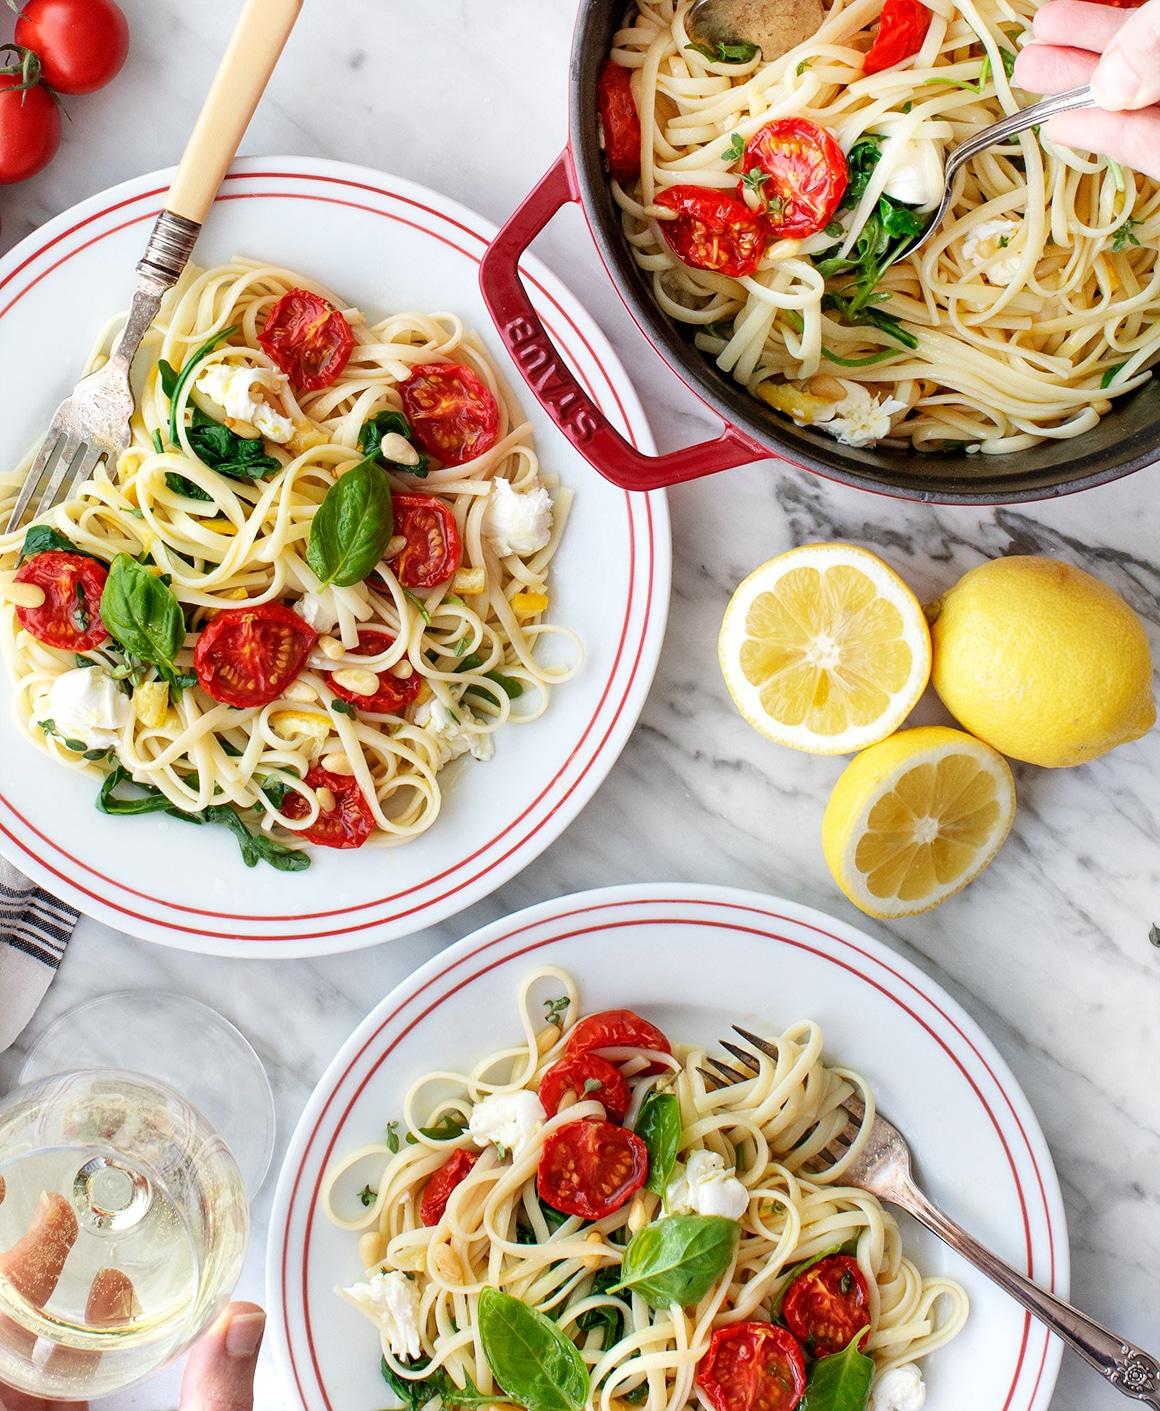 50 Fresh Tomato Recipes - Love and Lemons